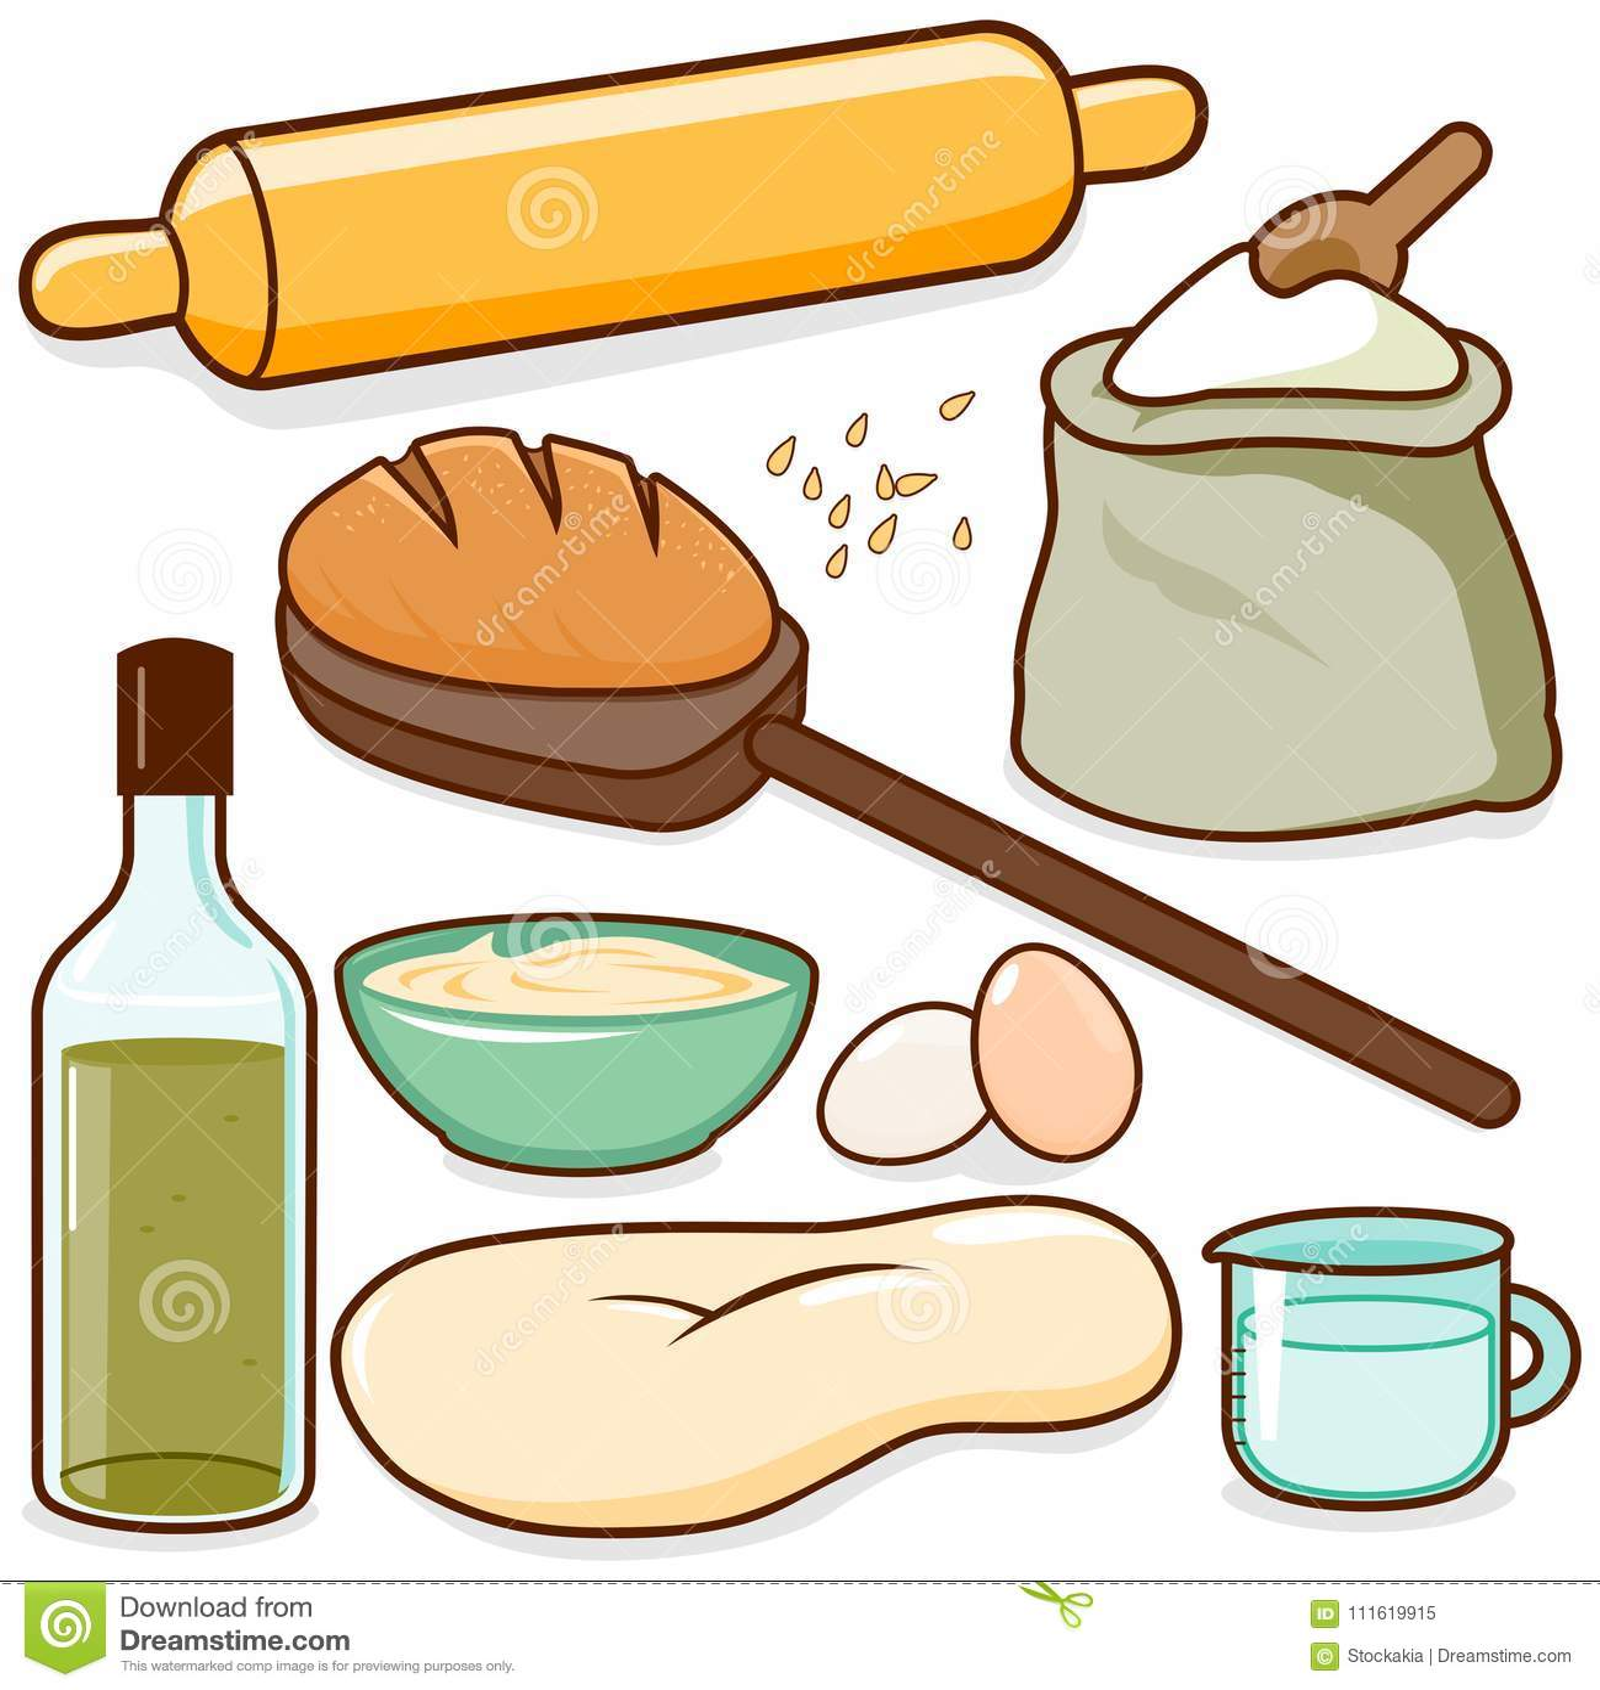 Bread baking recipe ingredients